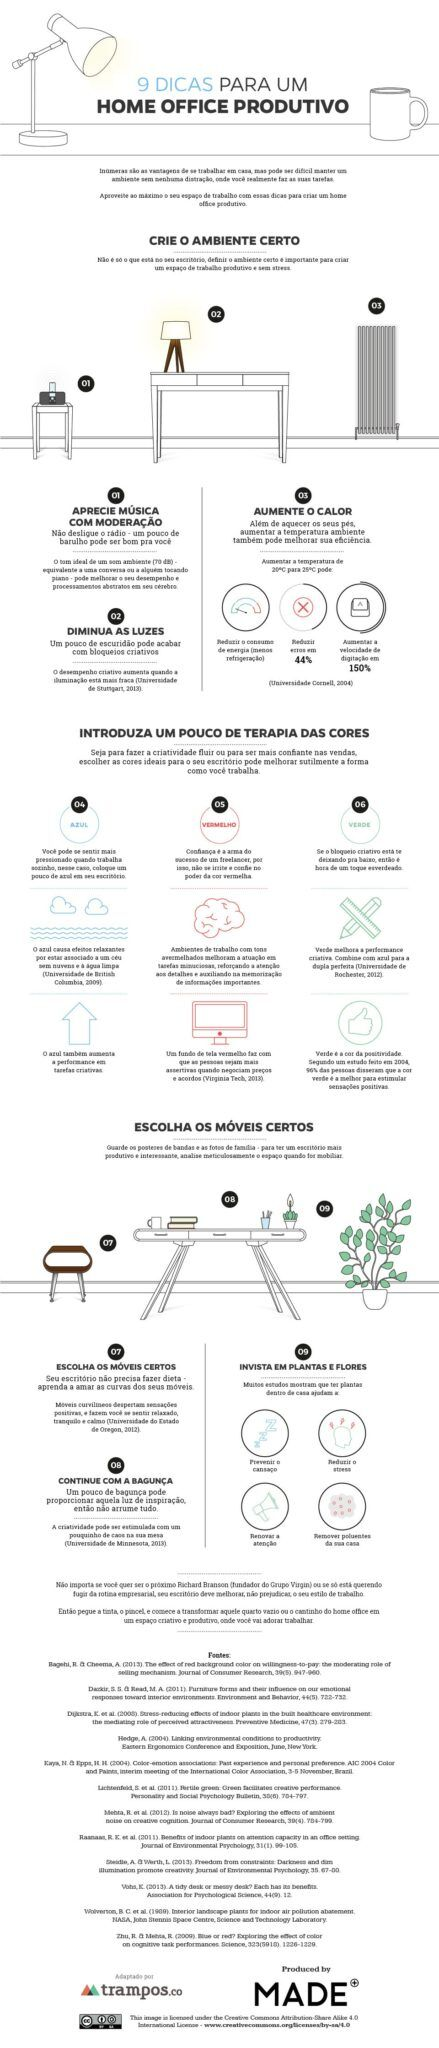 infográfico home office produtivo